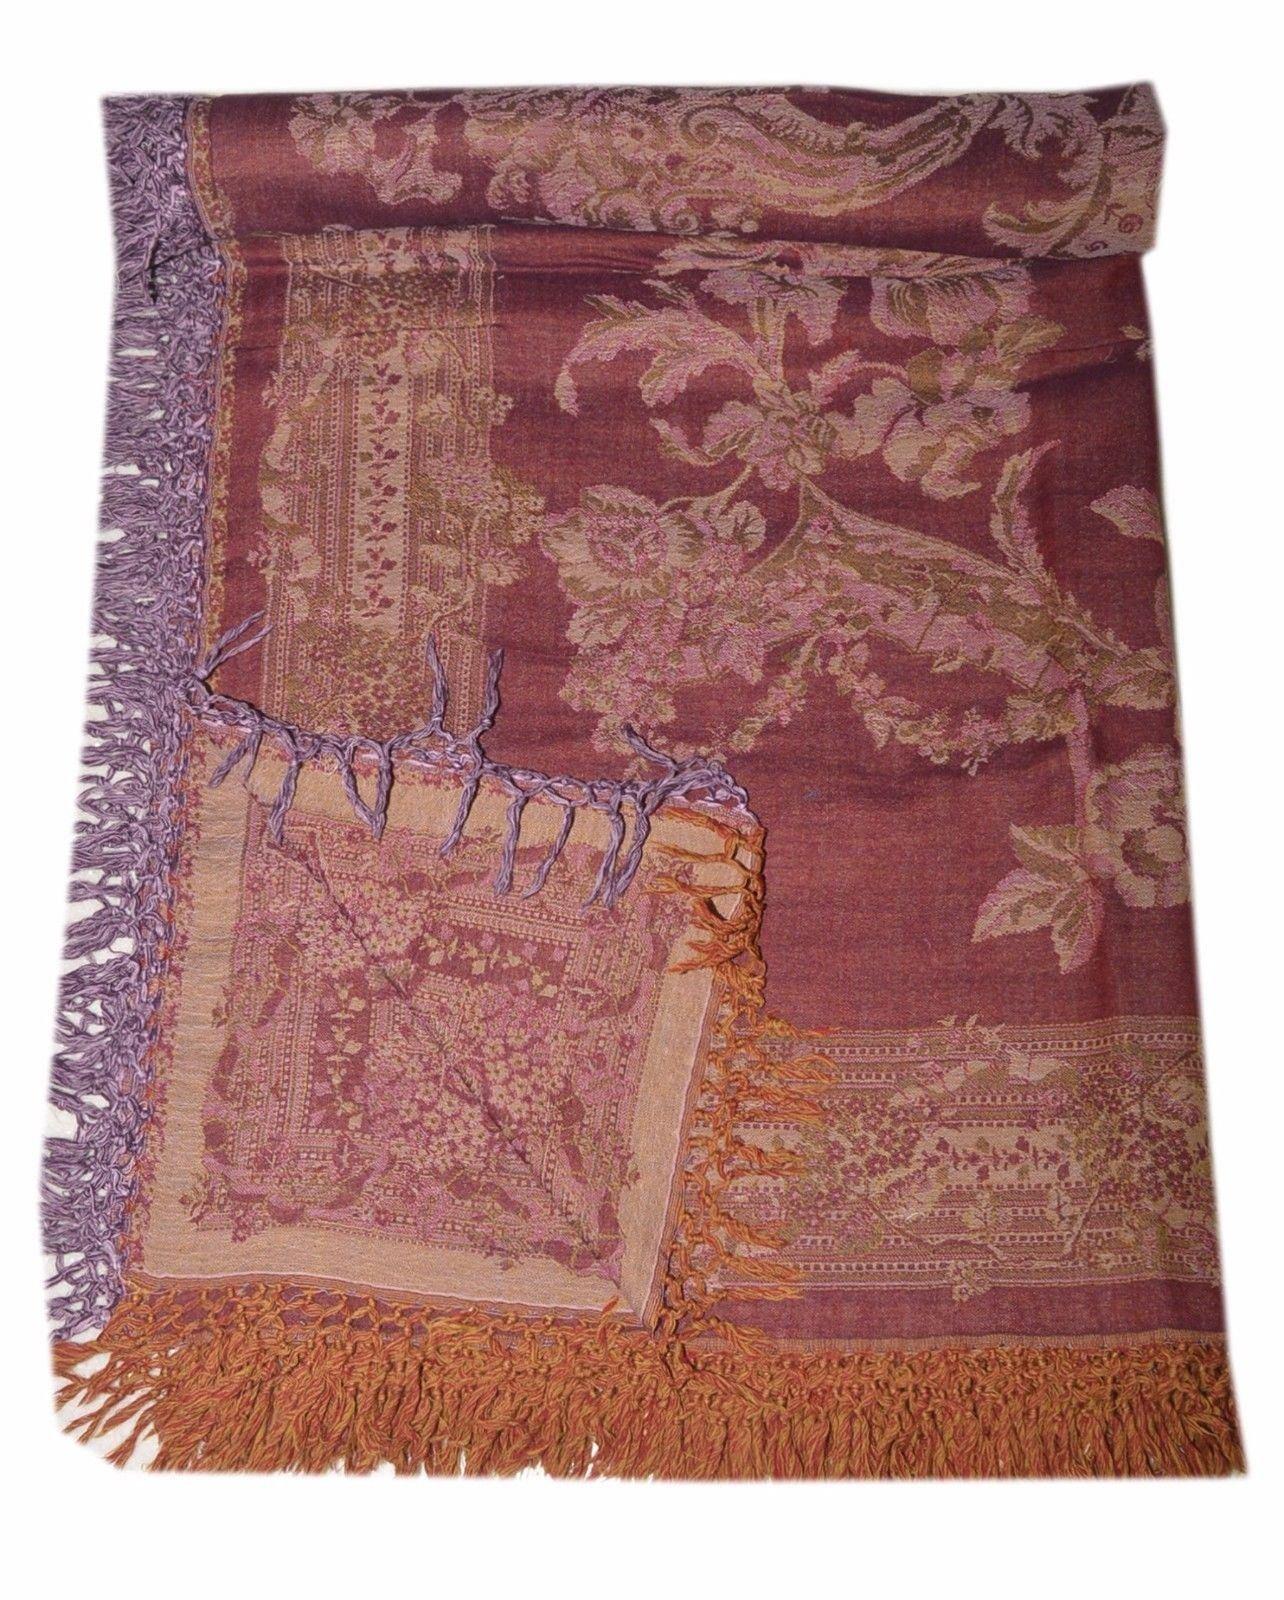 Blanket Throw Tree Of Life Bedspread Wool Indian Bedding Sofa Cover SL865